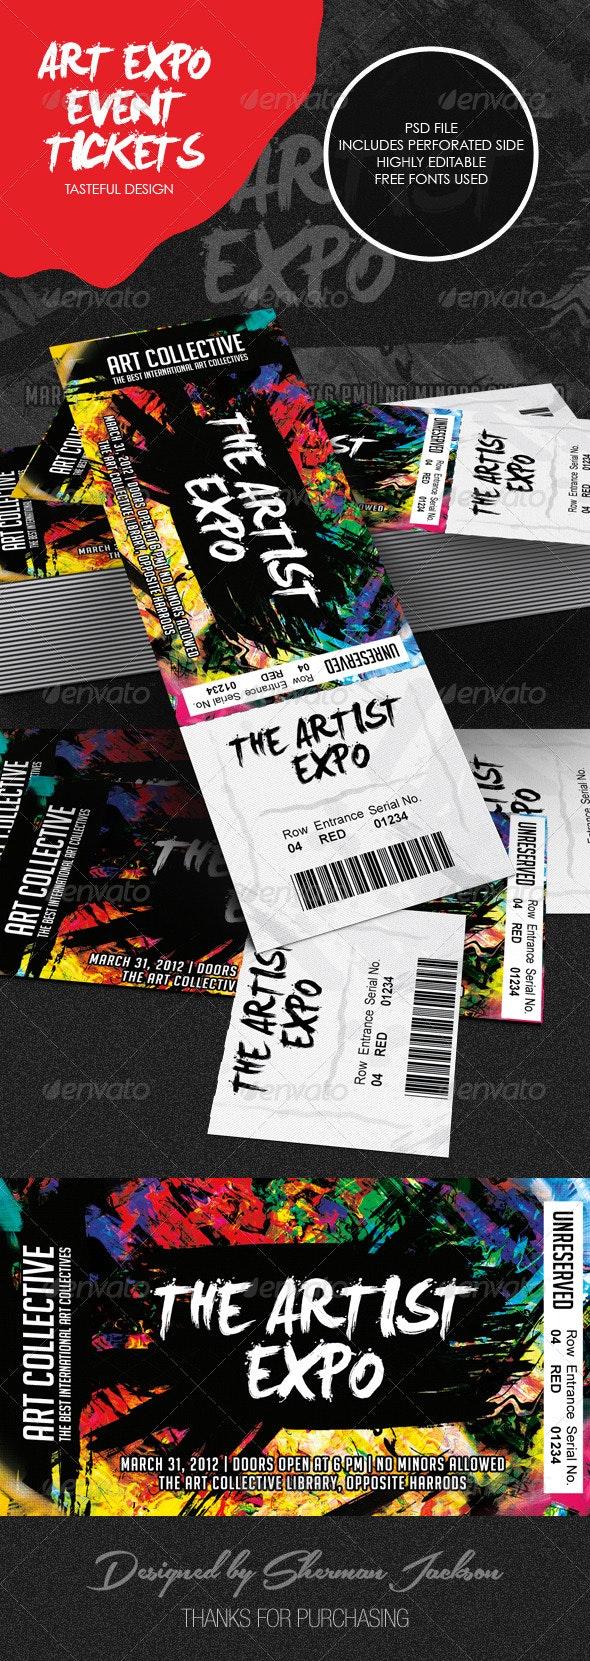 Art Event Ticket Template - Miscellaneous Print Templates